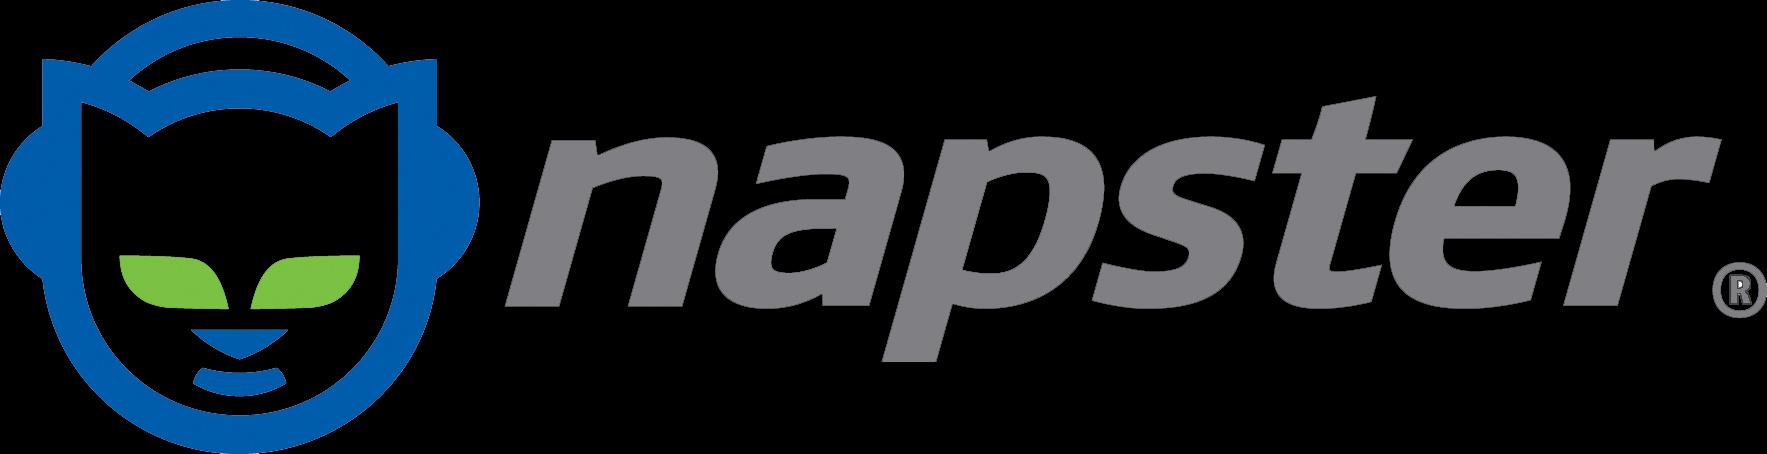 Napster Logo PNG - 31409